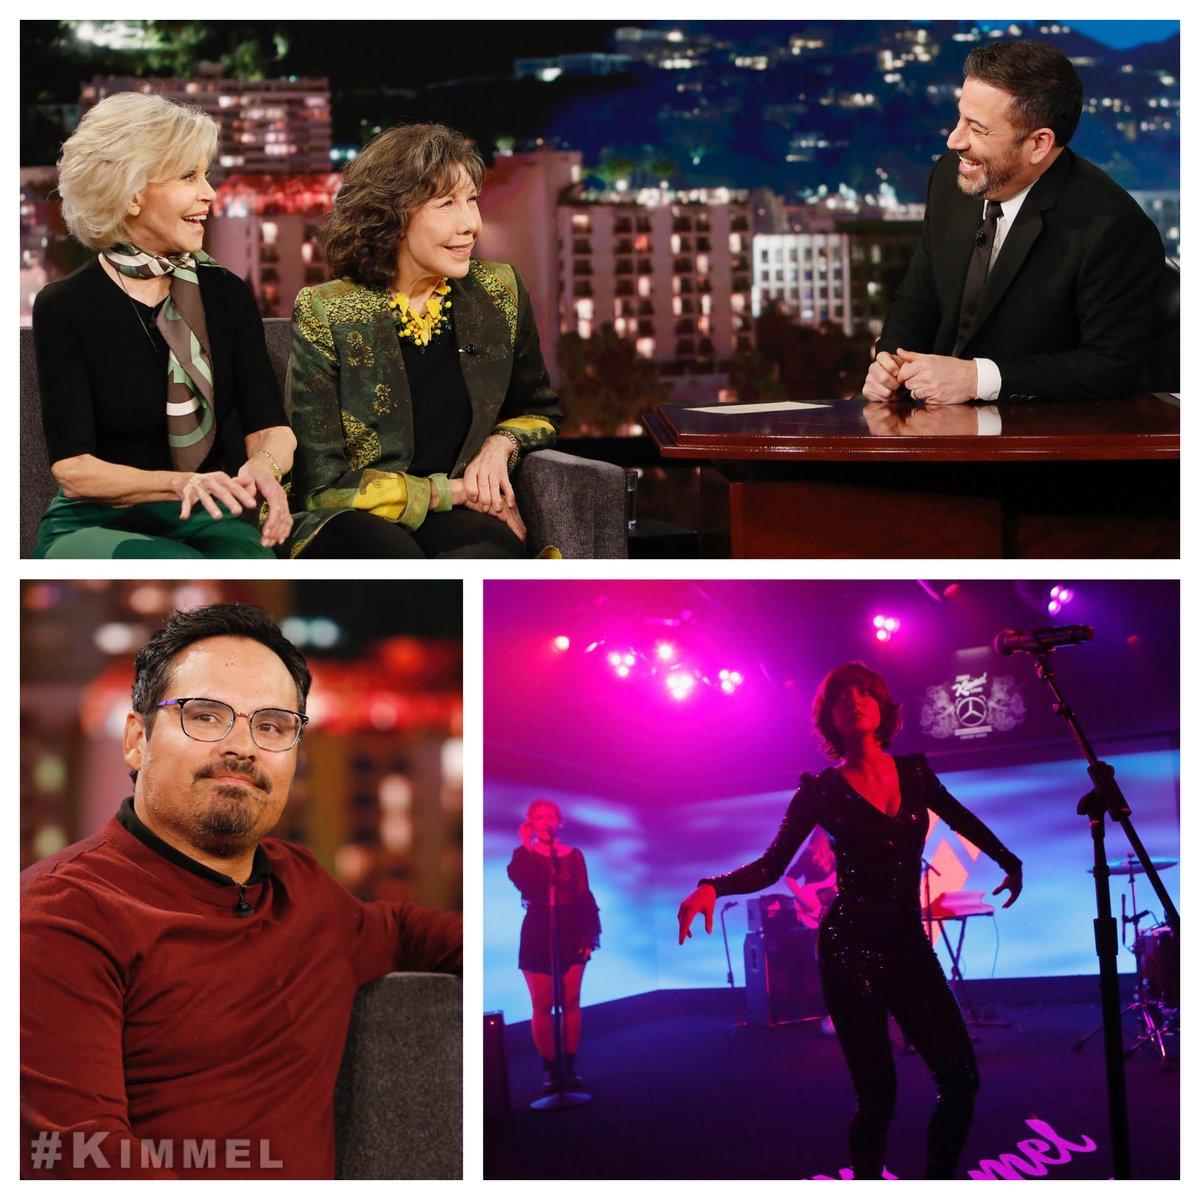 Tonight on #Kimmel  @LilyTomlin  & @JaneFonda  #GraceAndFrankie , @RealMichaelPena  #FantasyIslandMovie  and music from @MegMyers  on the @MercedesBenzUSA  stage #RunningUpThatHill